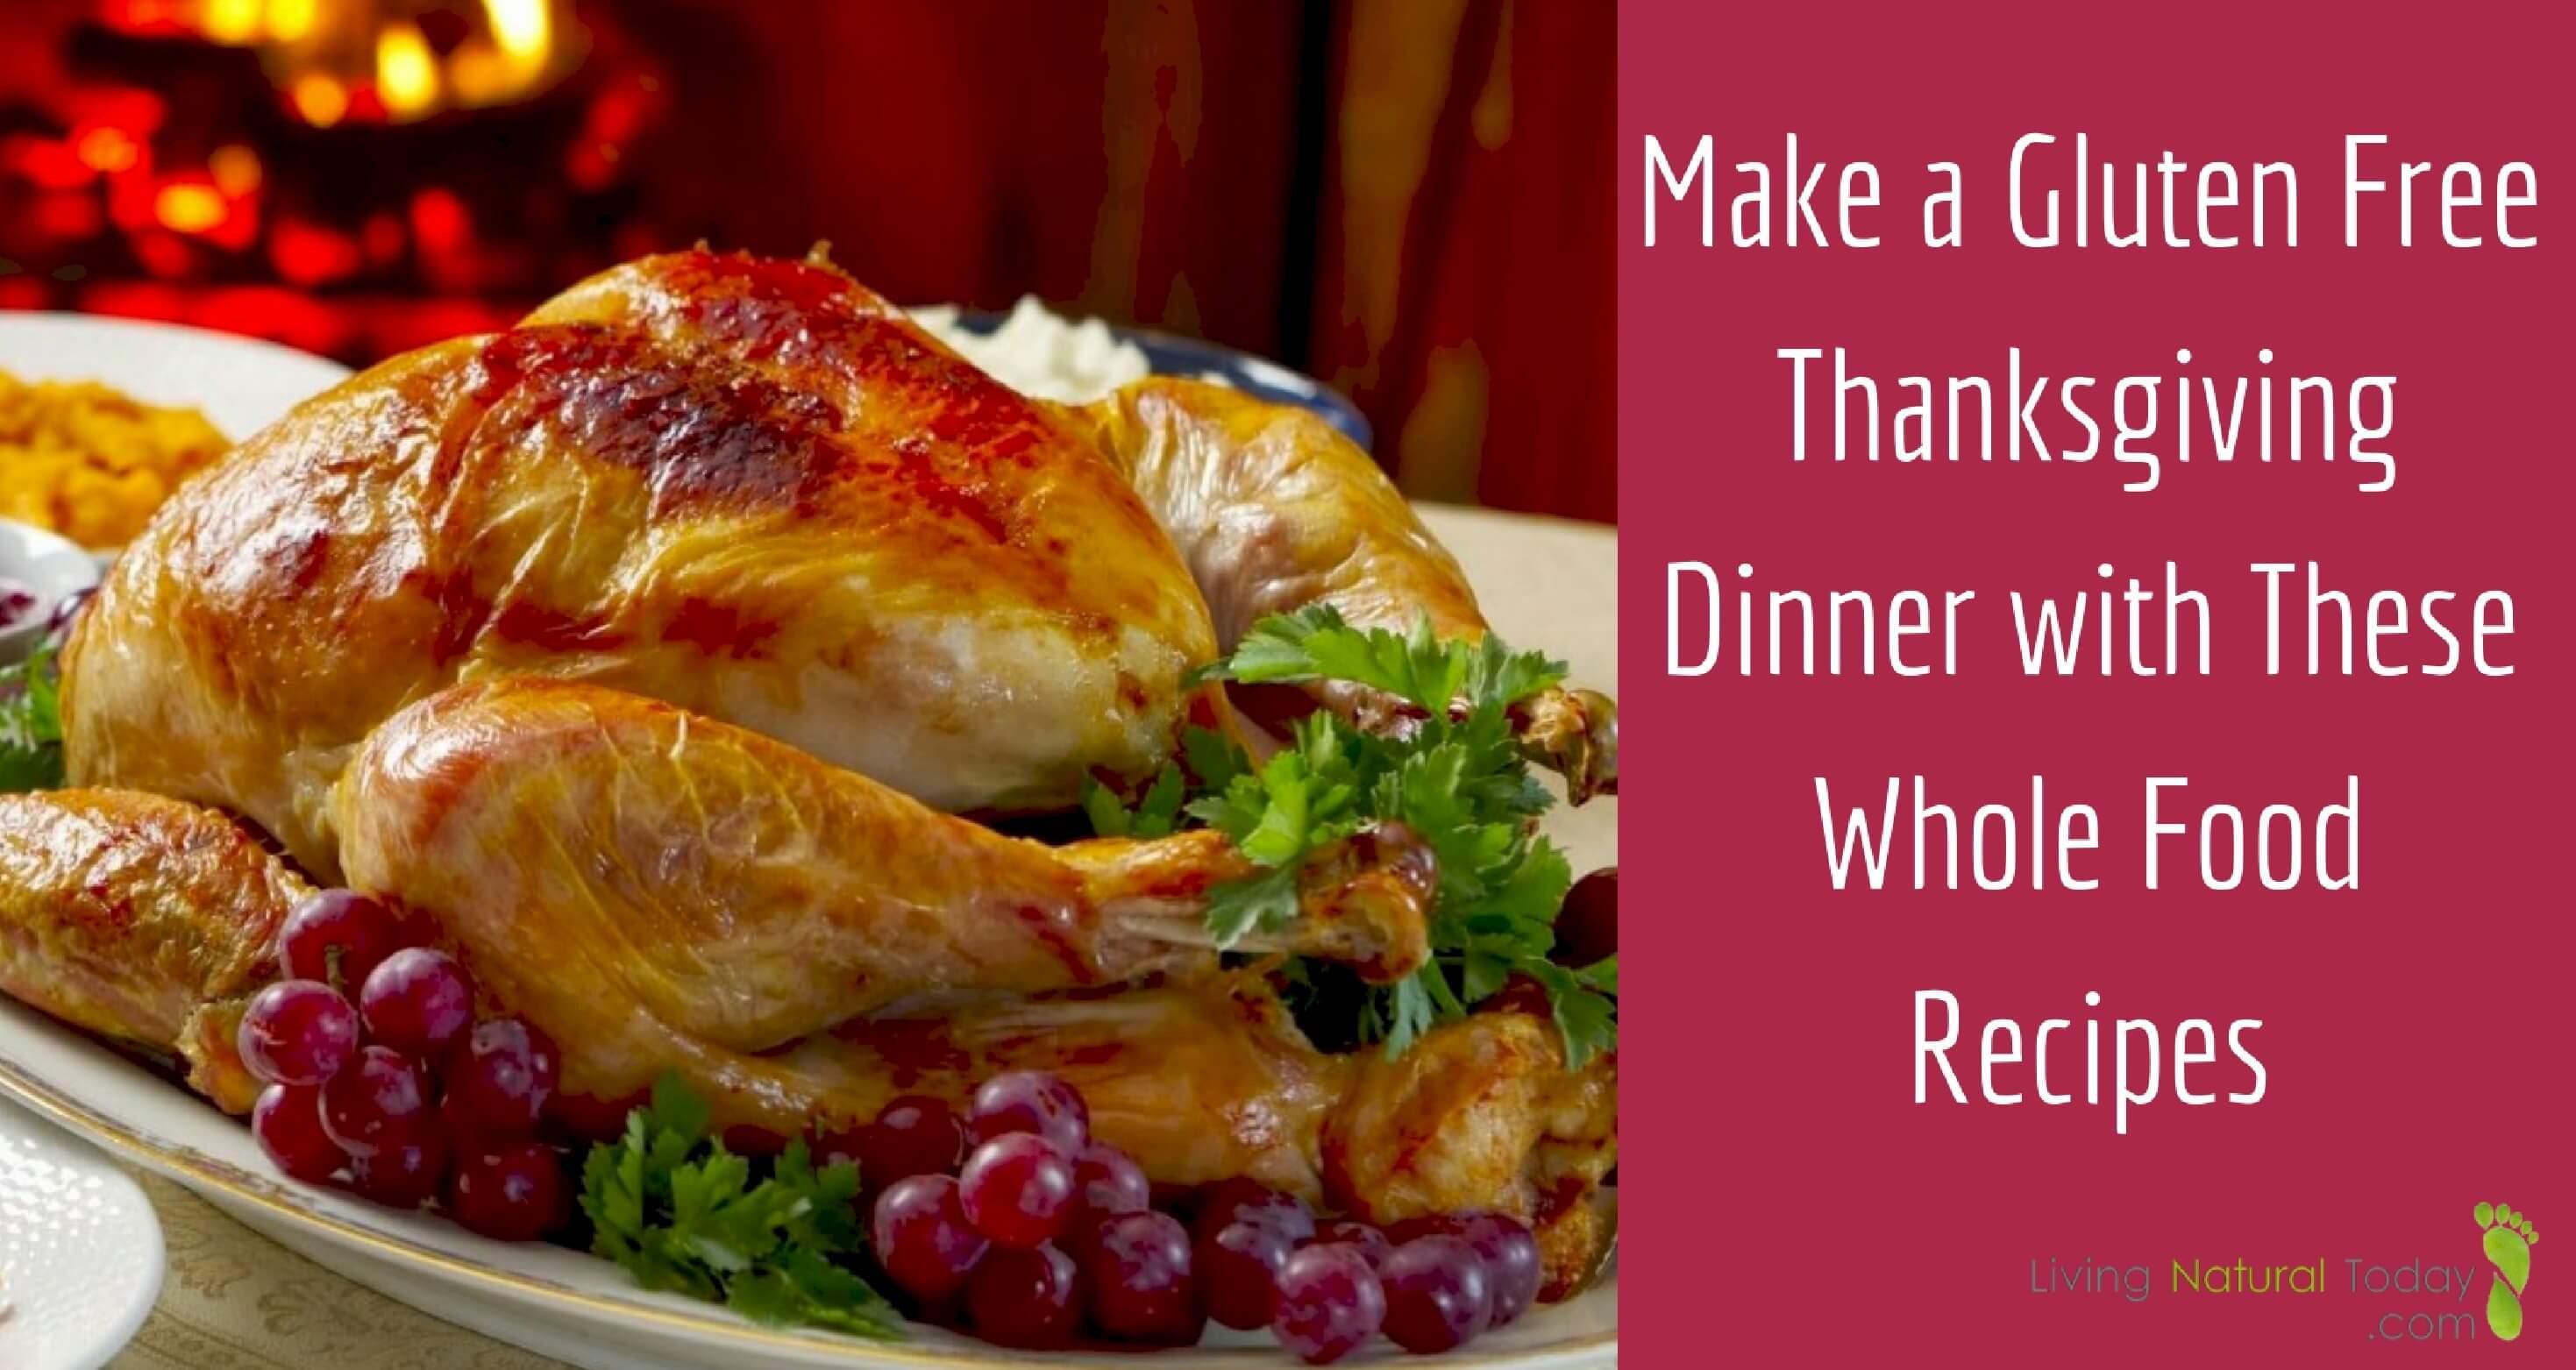 Whole Food Thanksgiving Dinner Order  Gluten Free Thanksgiving Dinner Whole Food Recipes